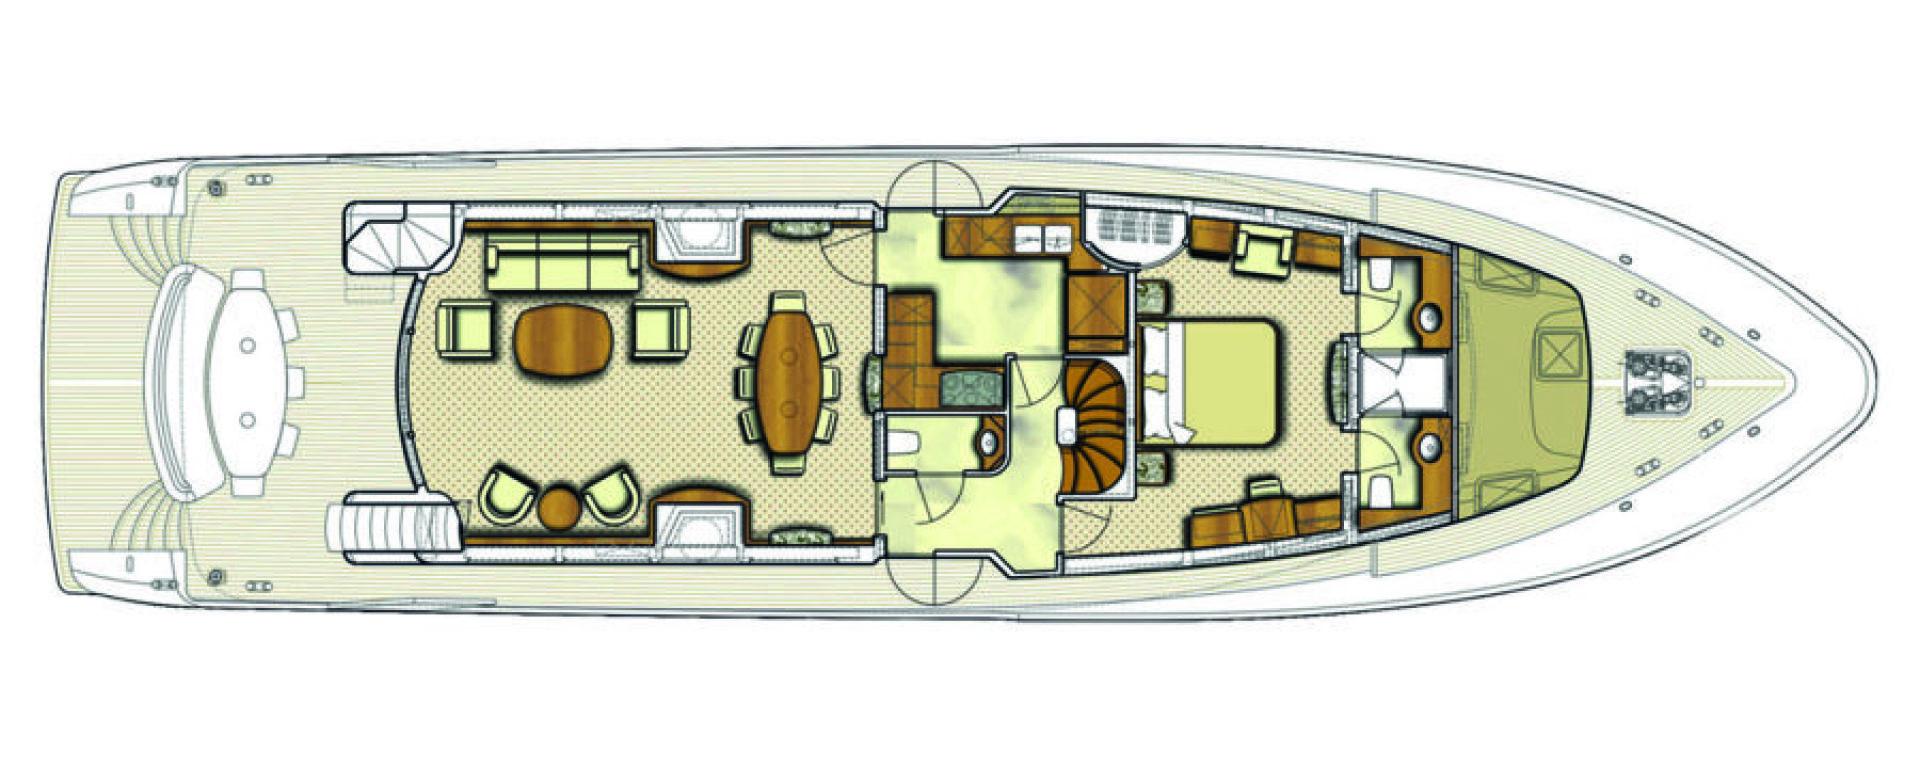 Conrad Shipyard-88 Motor Yacht 2005-Chillin Fort Lauderdale-Florida-United States-Conrad Motor Yacht 2005 Chillin-1537347 | Thumbnail